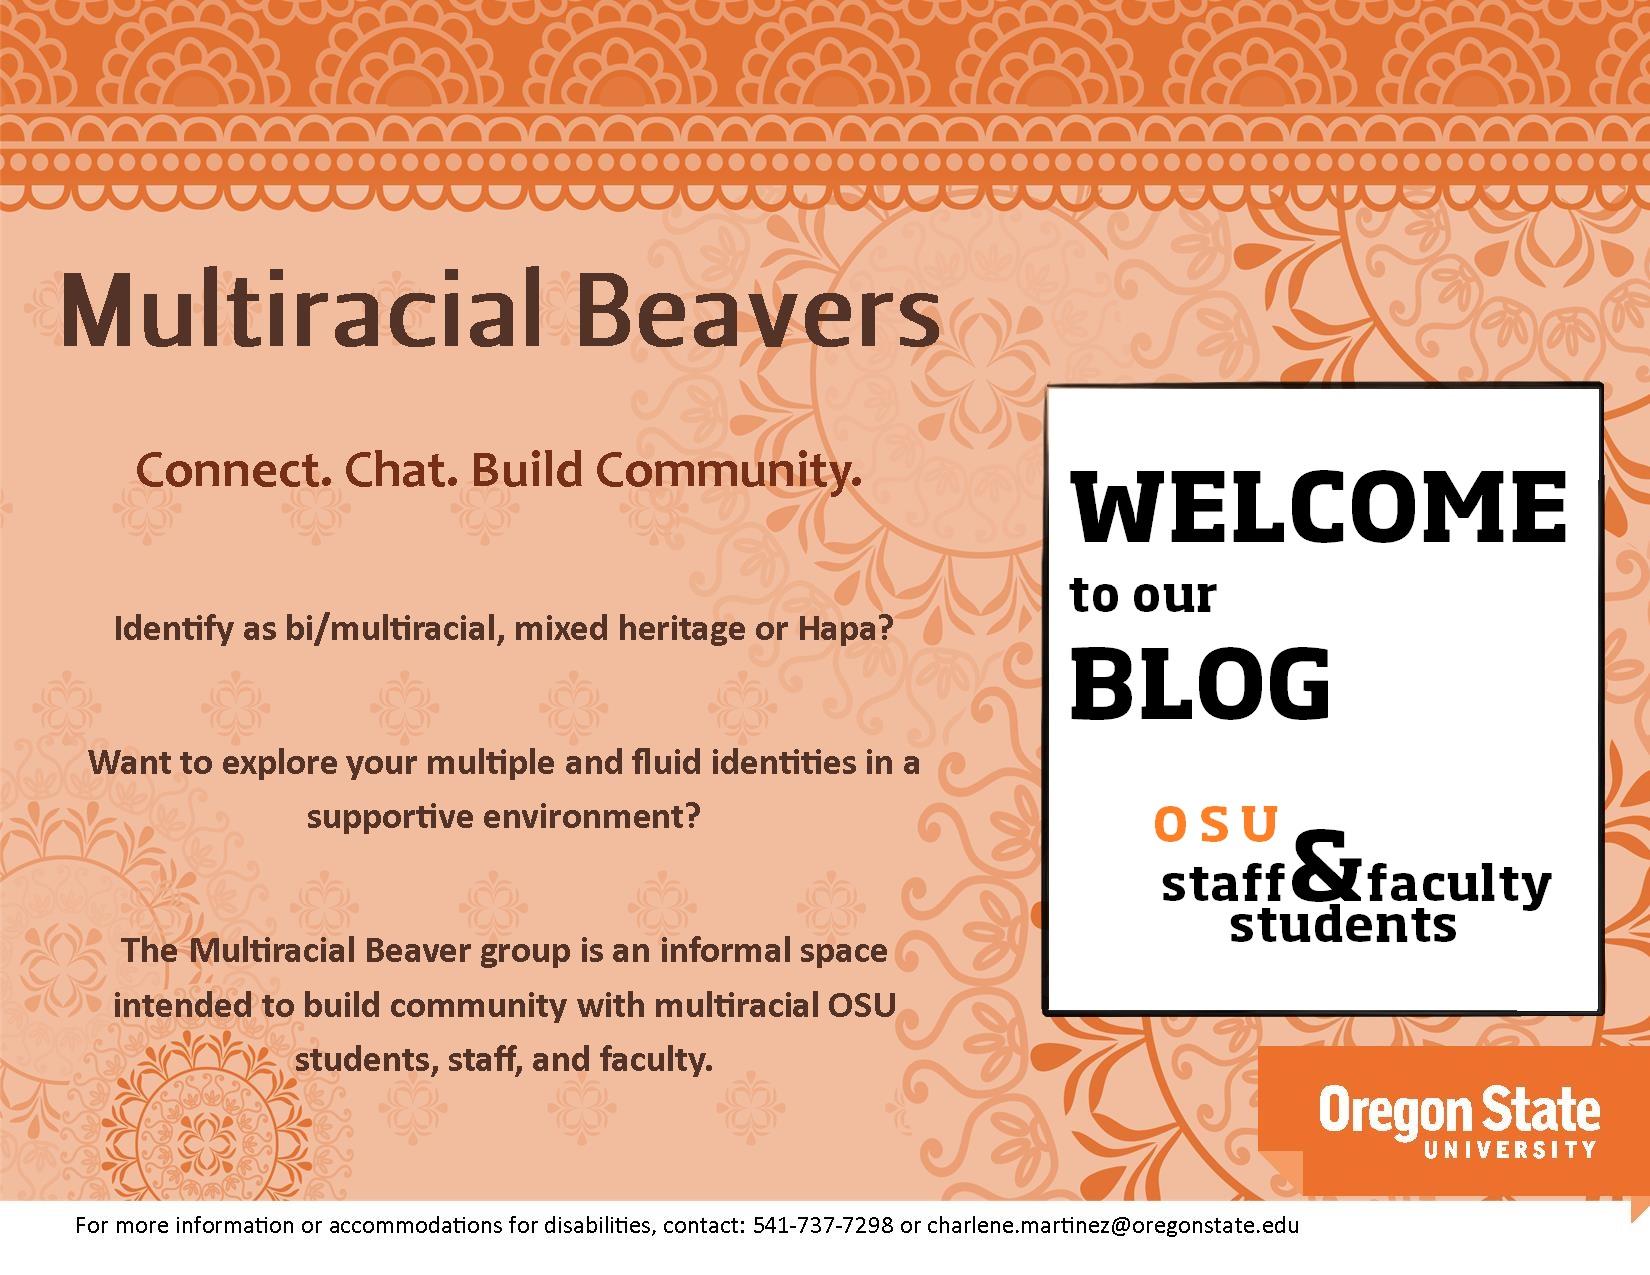 multiracialbeavers_spring2014